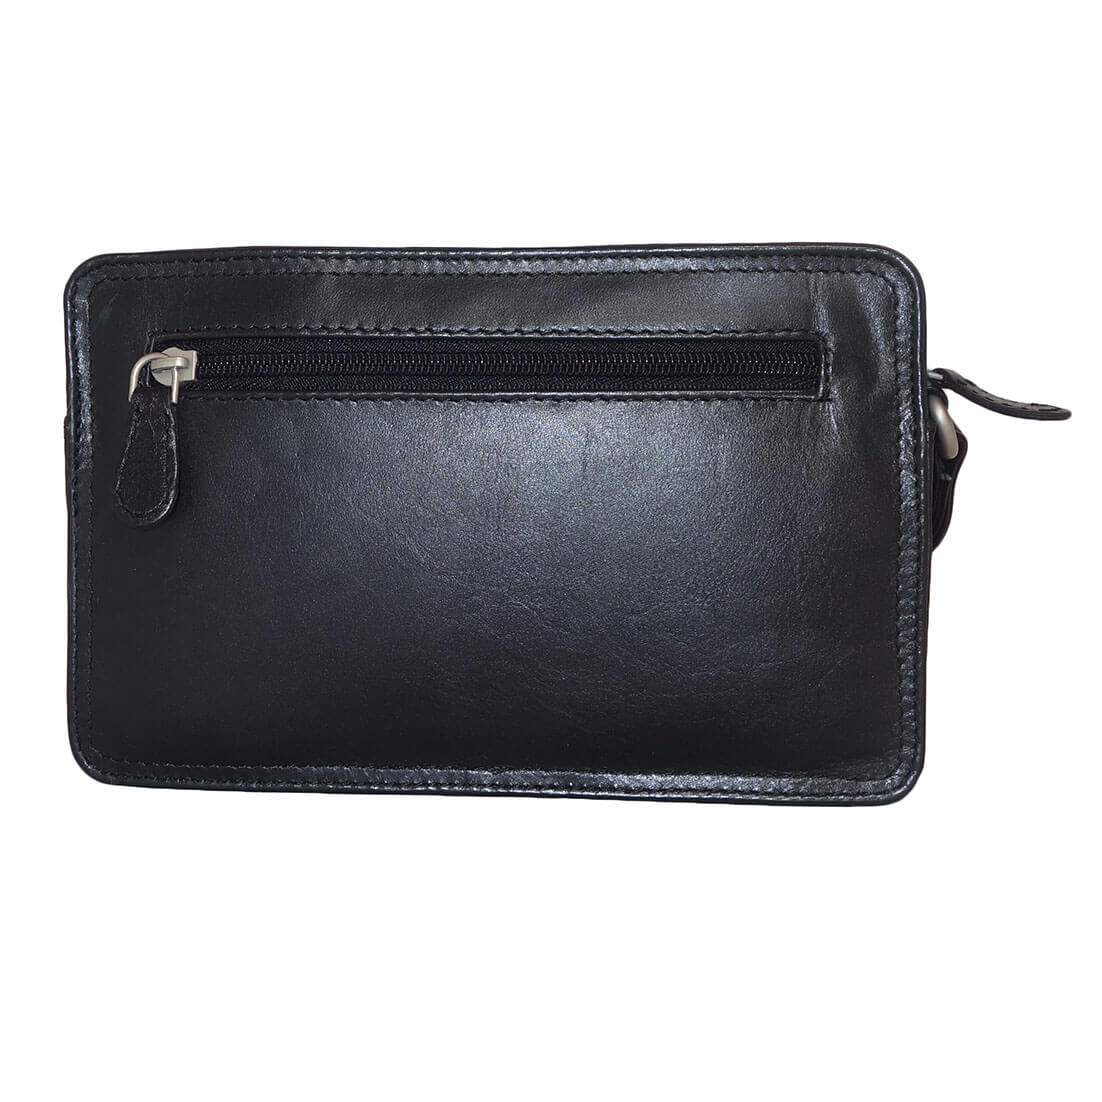 e9994a3de3d ... Leather Design Leren Polstas Zwart met 3 Vakken-17931 ...